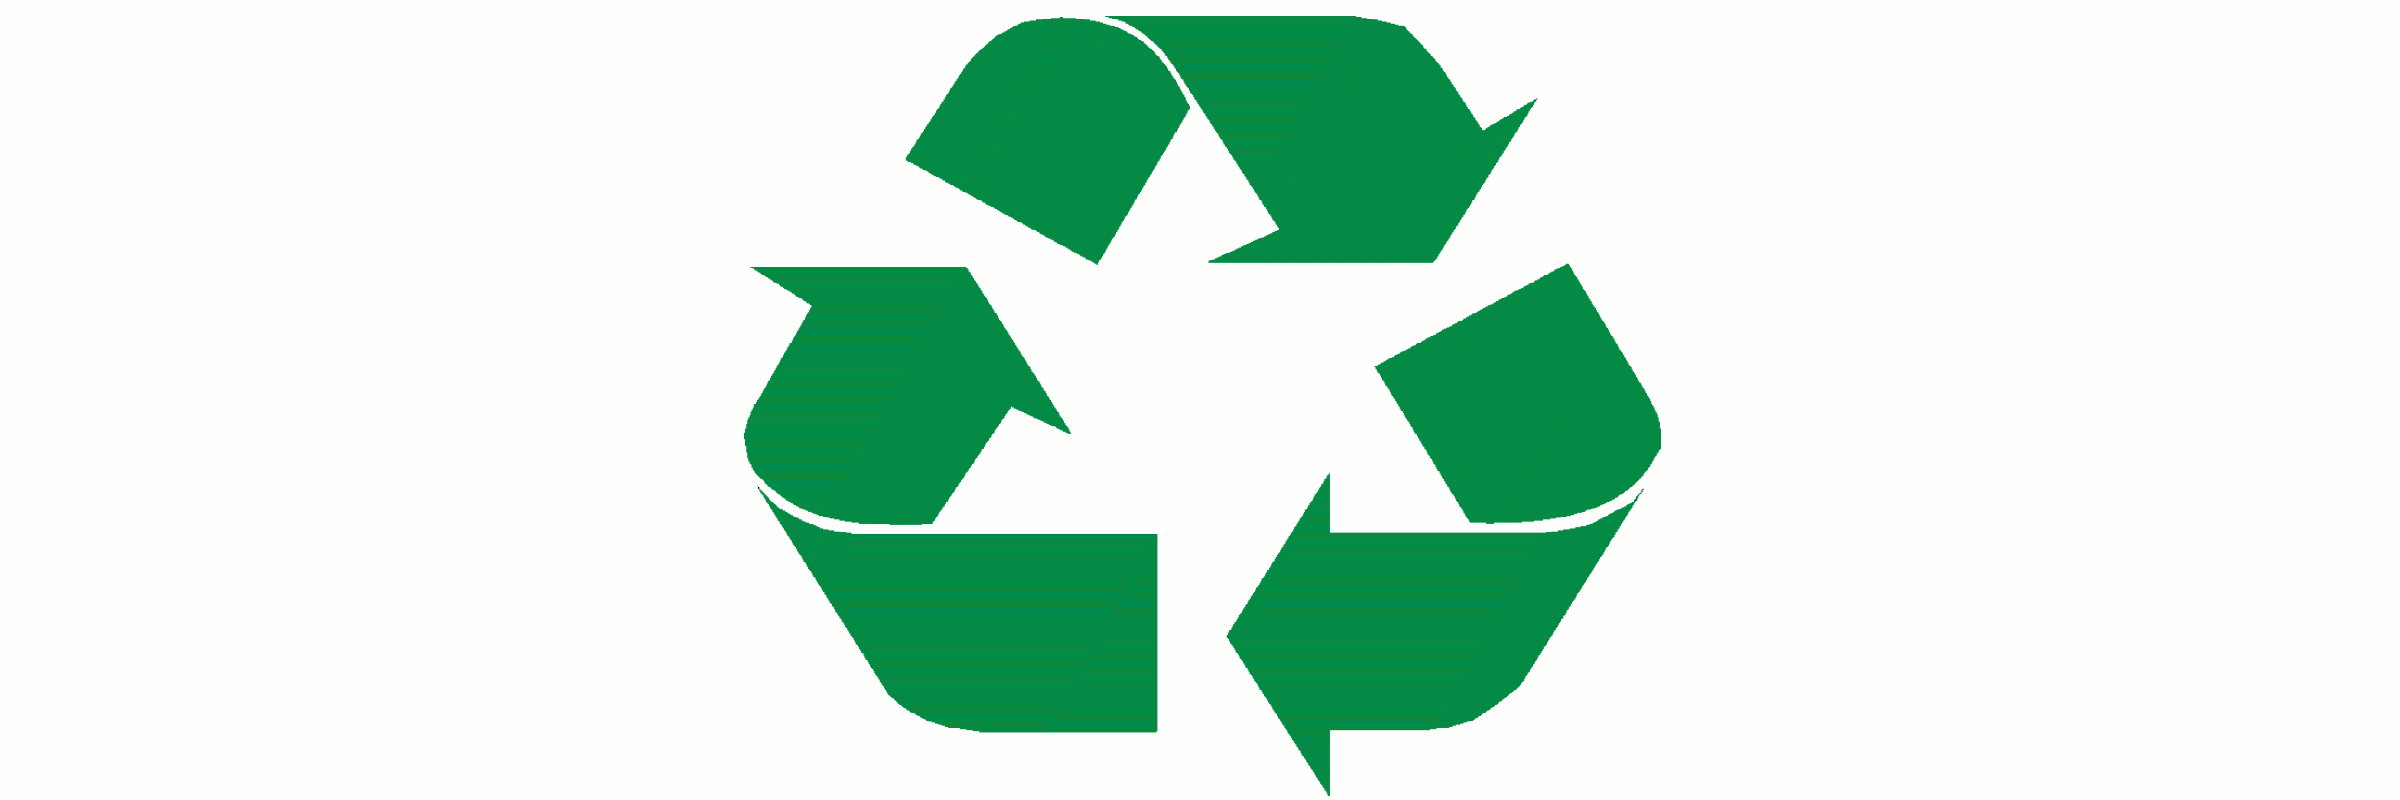 Uniform Recycling